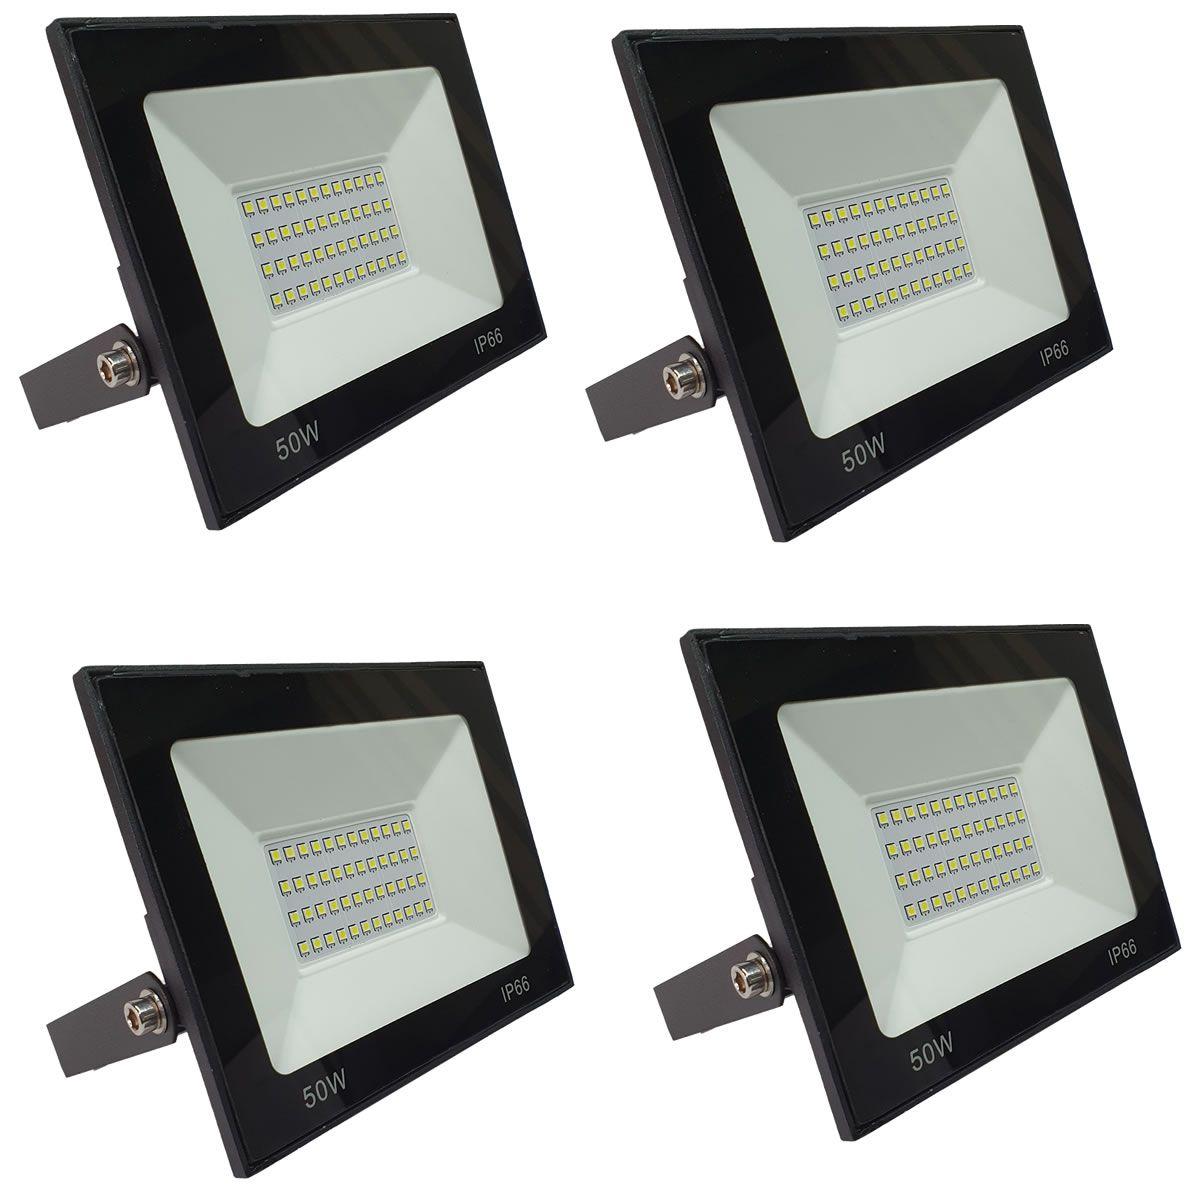 KIT 4 refletor 50w LED SMD Holofote Bivolt Externo Luz Branca